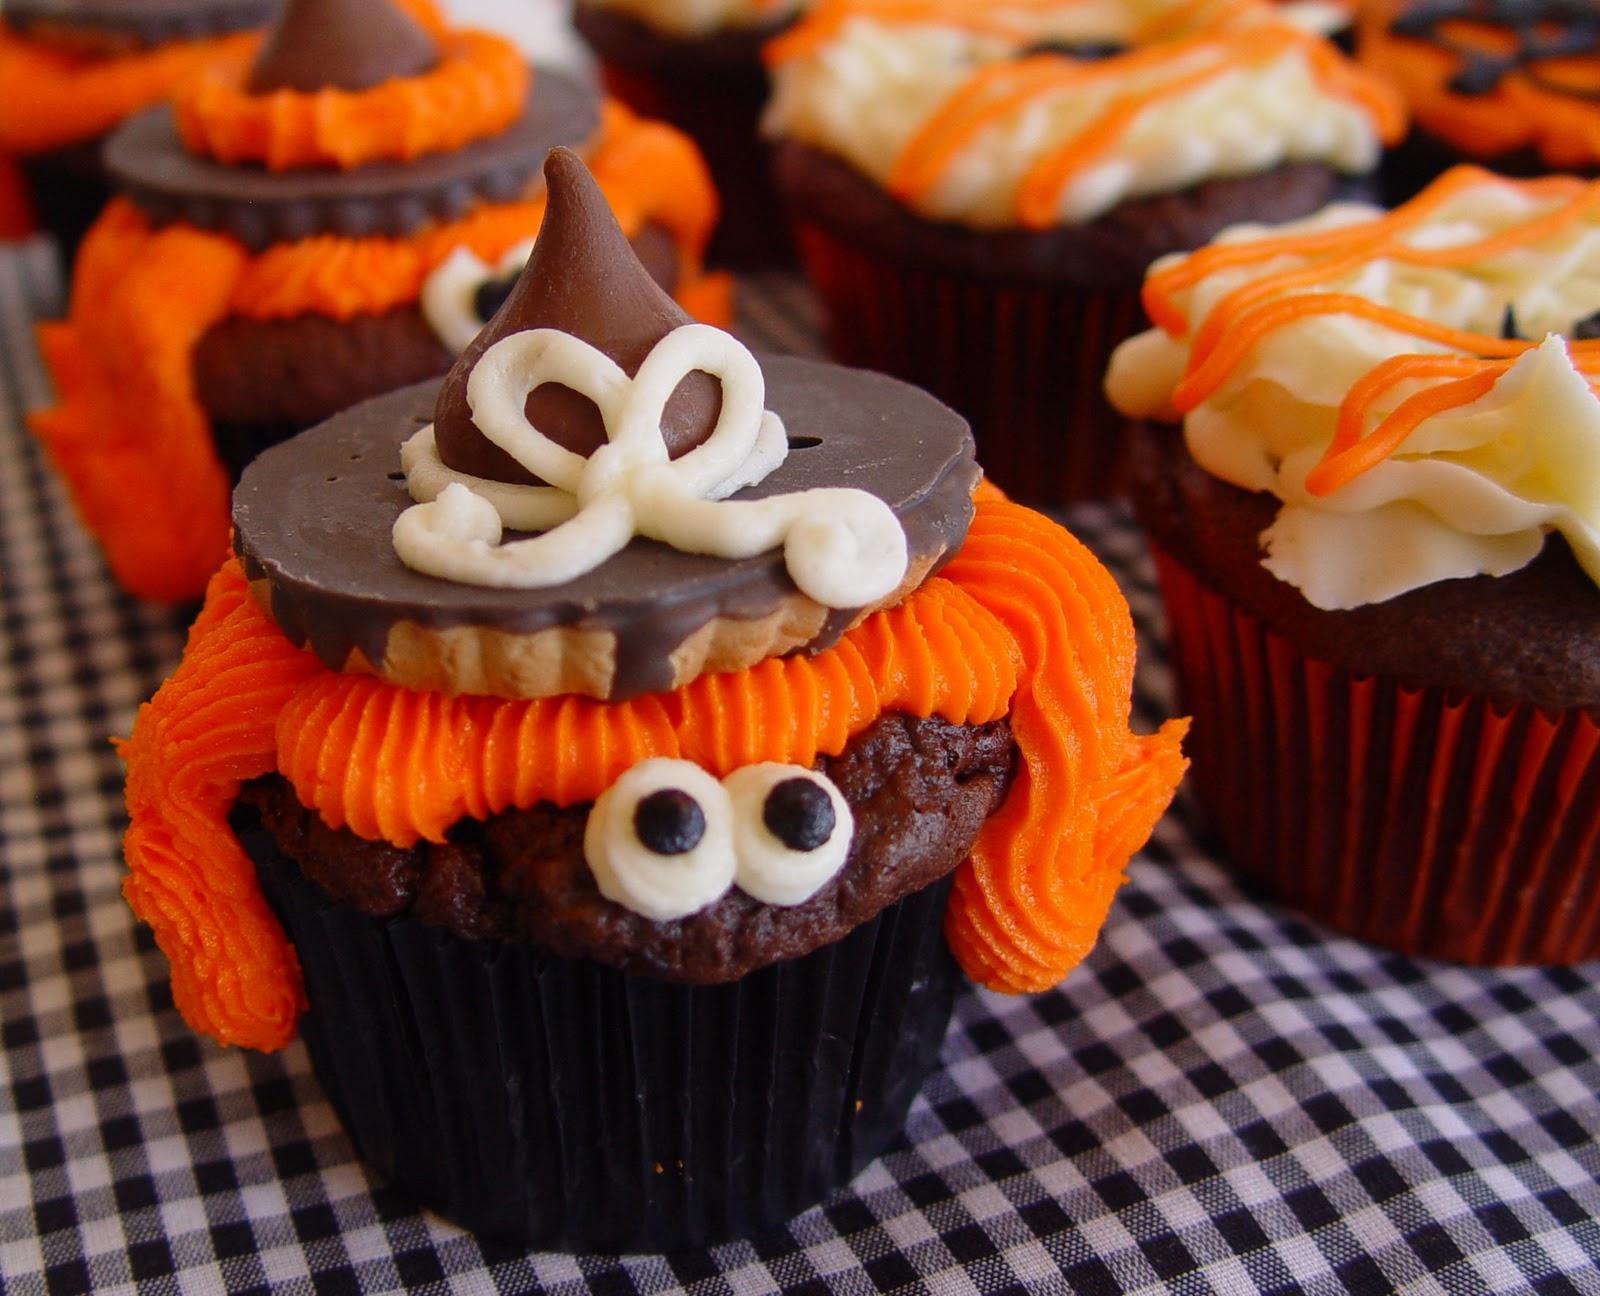 Spook tacular halloween cupcakes - Halloween decorations for cupcakes ...